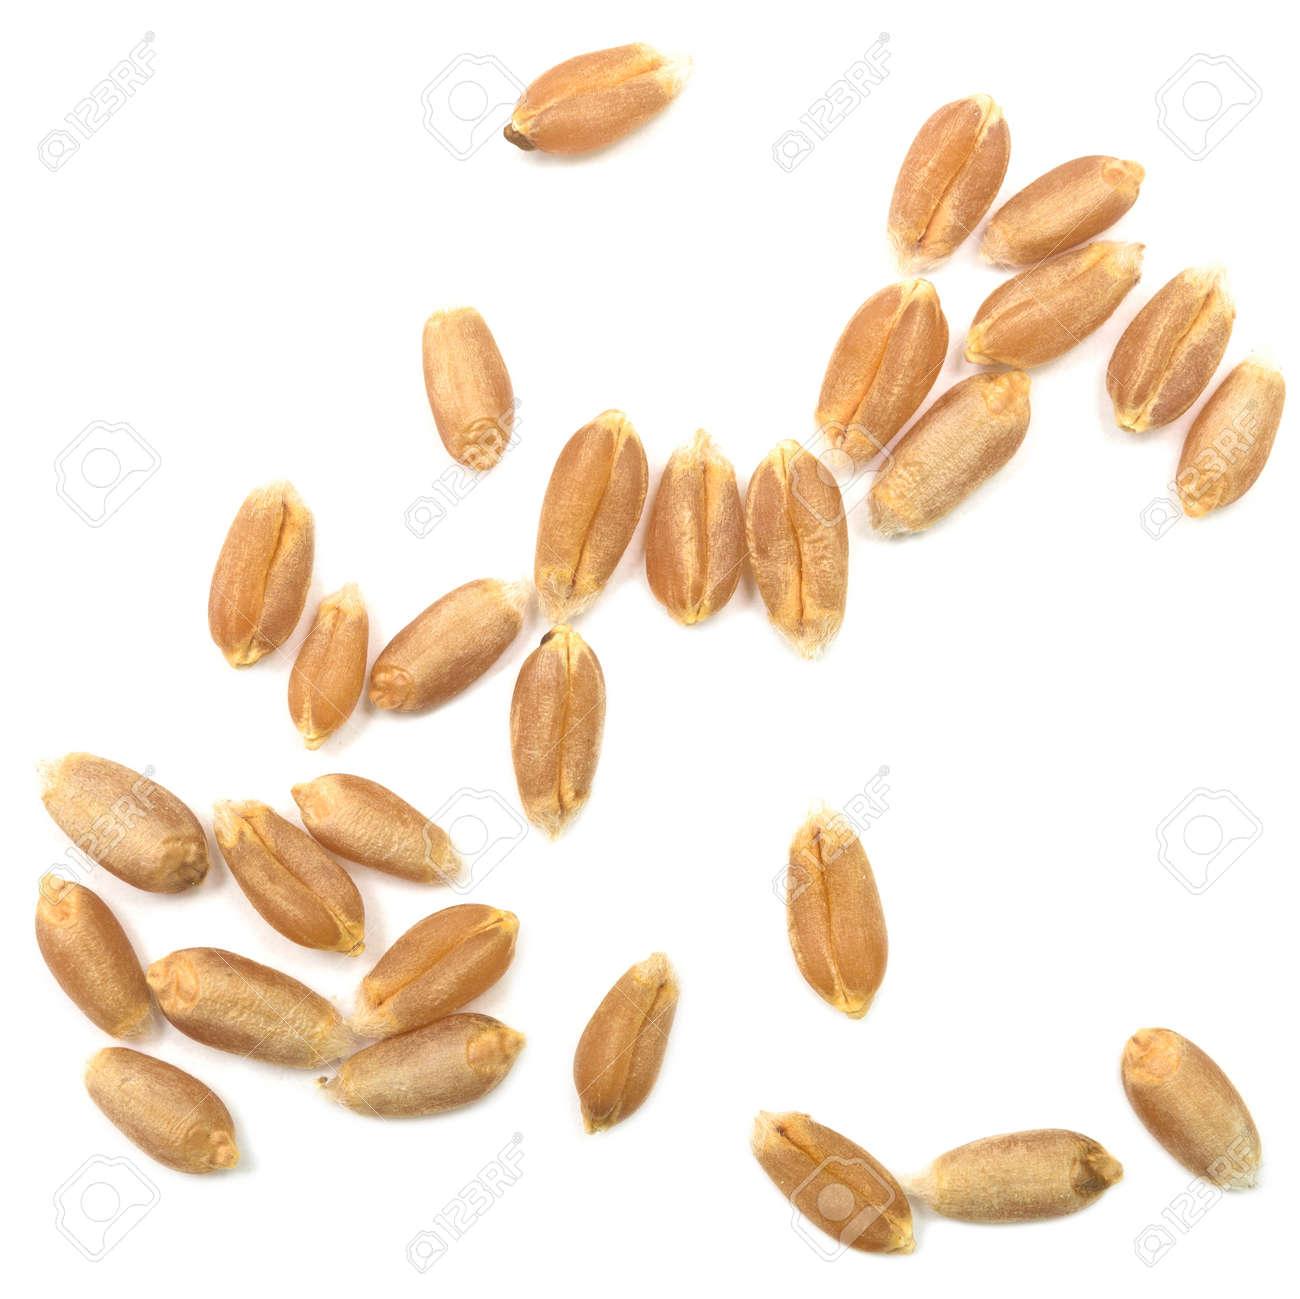 wheat grain isolated on white background Standard-Bild - 35230180